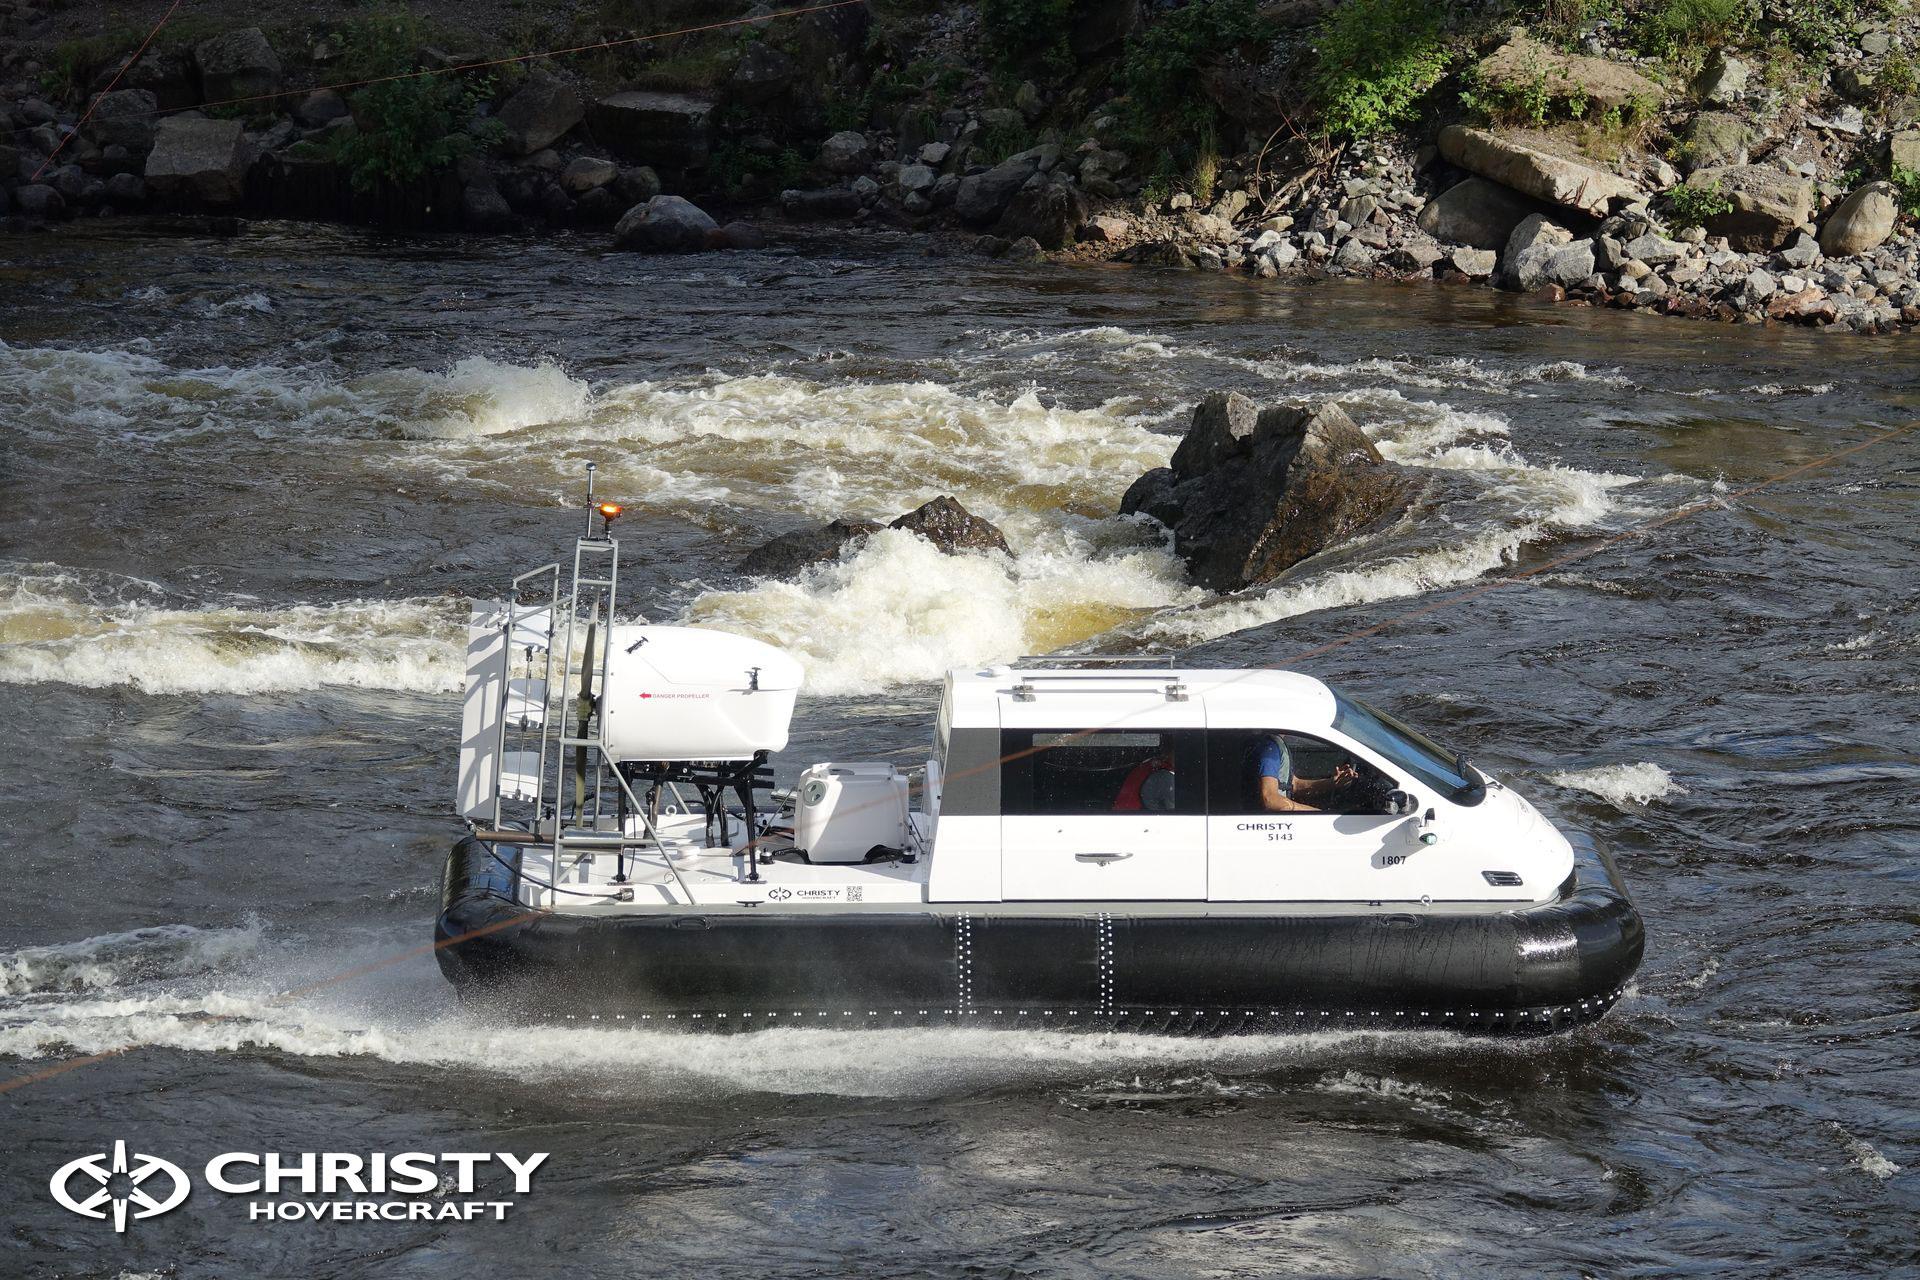 Hovercraft-Christy-5146-FC-14.jpg | фото №7